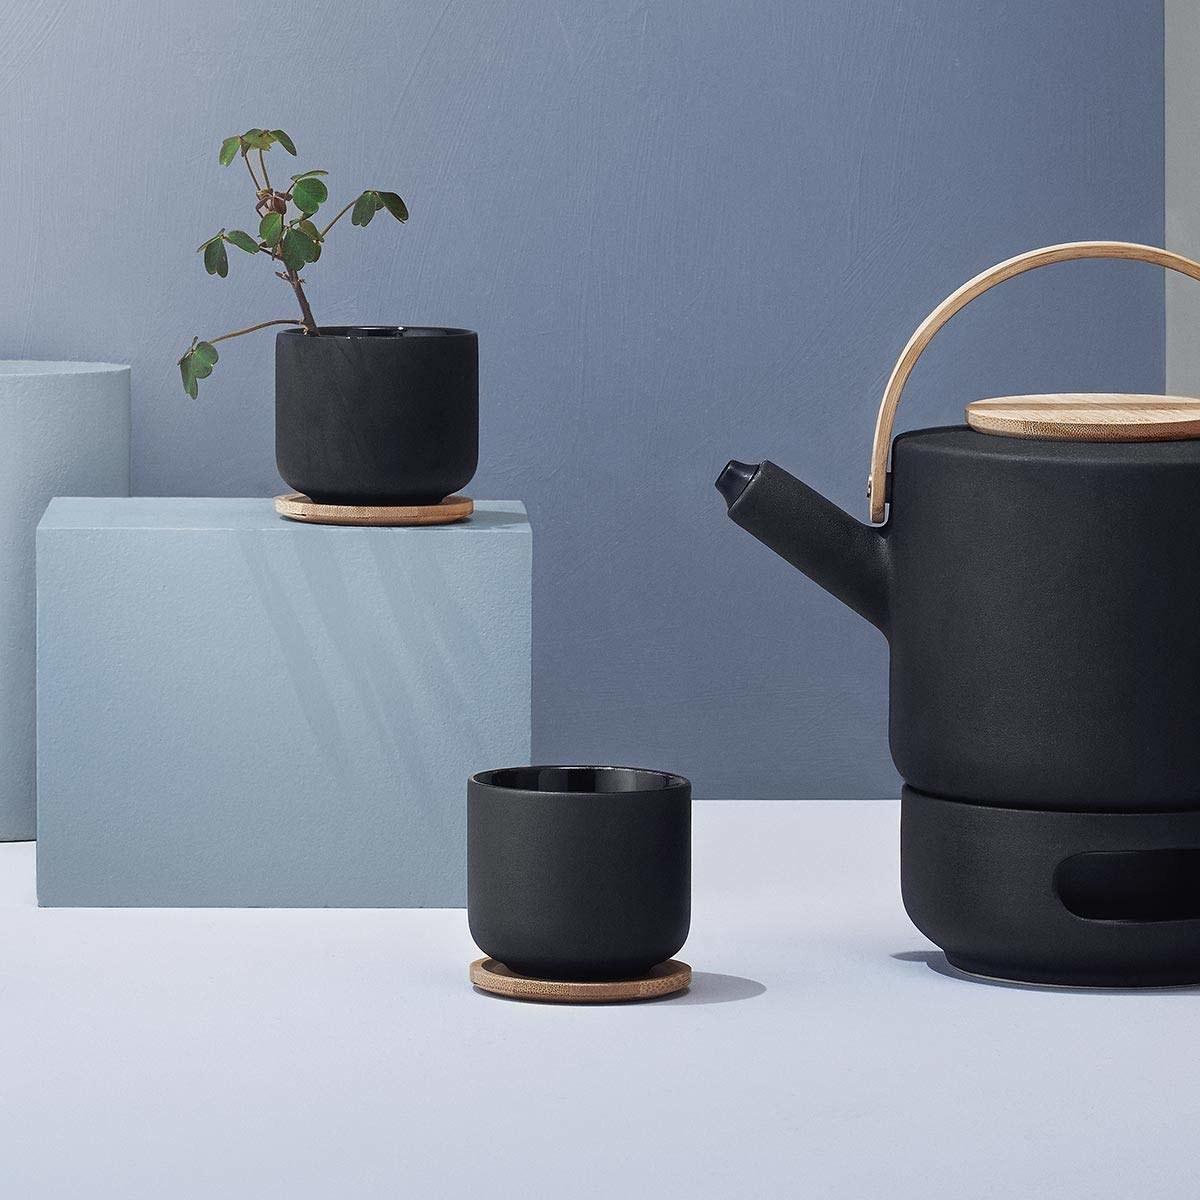 A minimal arrangement of the tea pot and two tea cups